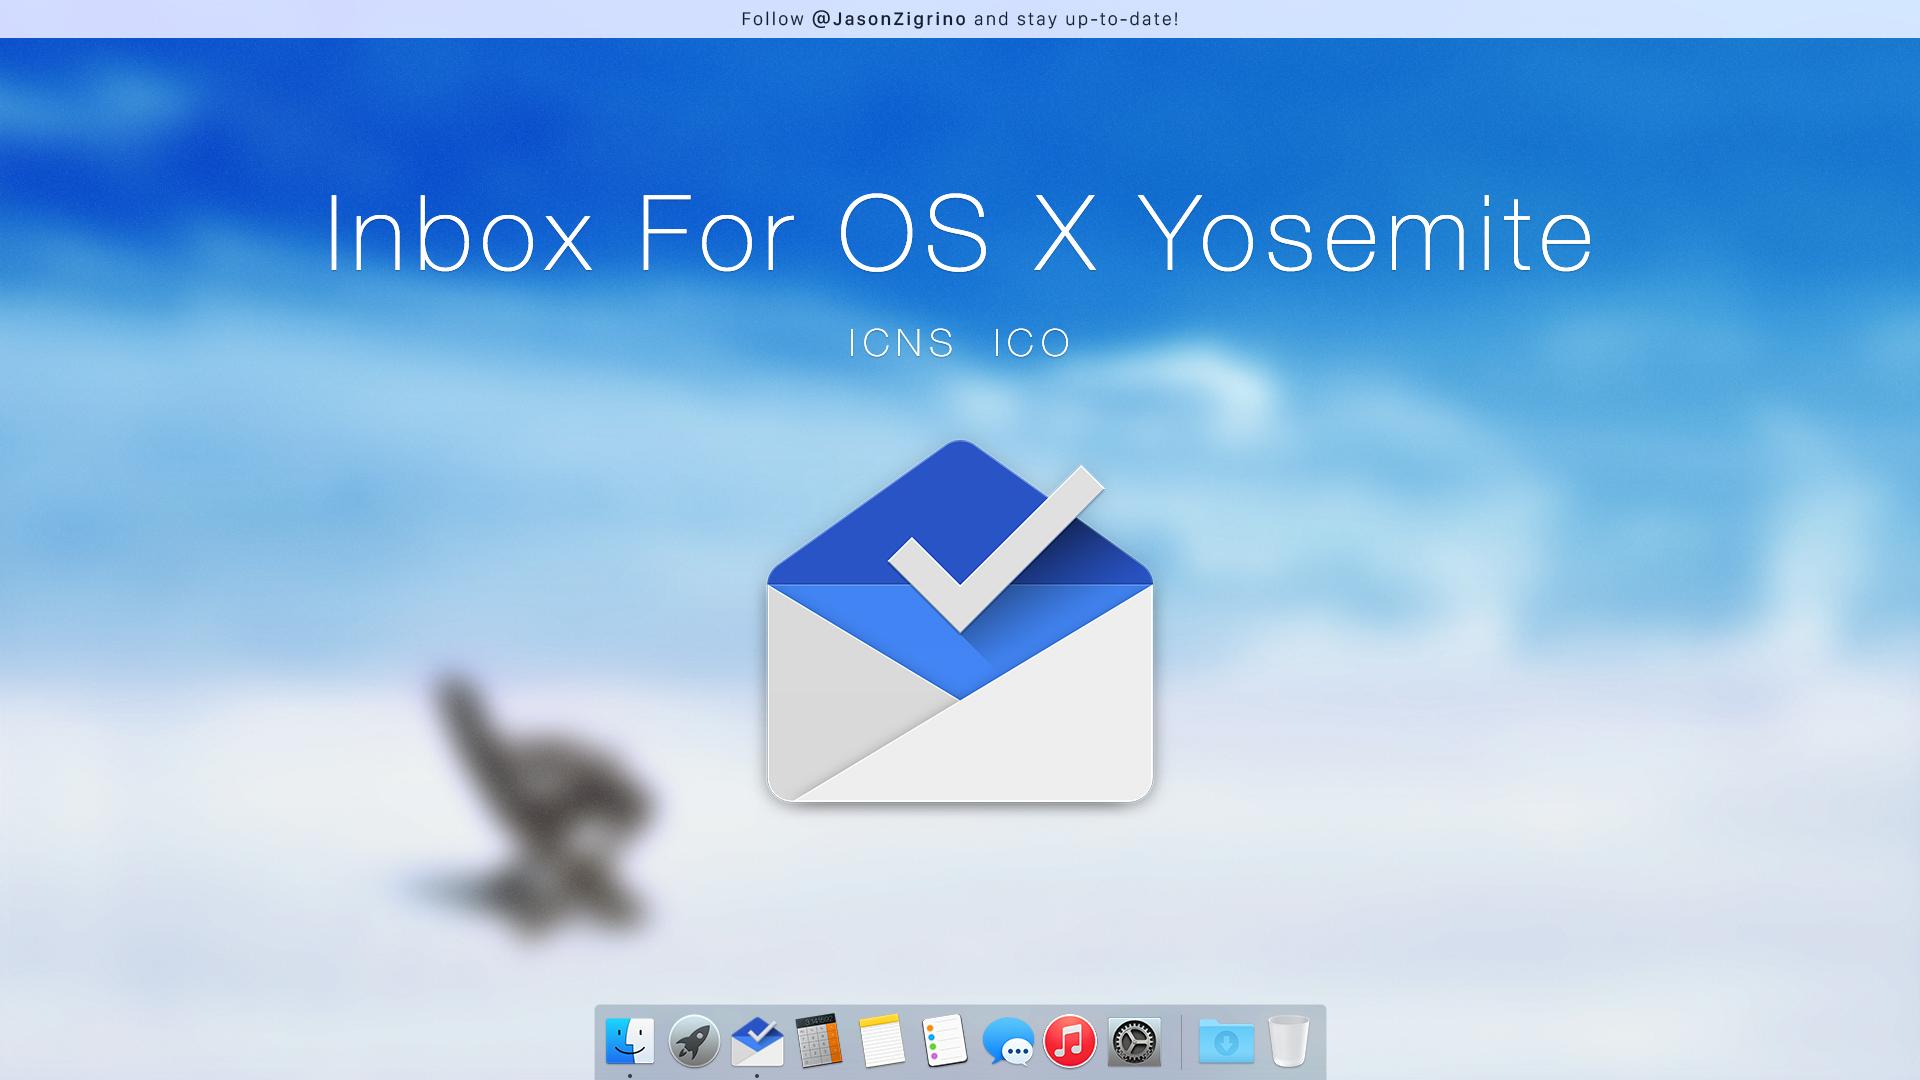 Google Inbox For OS X by JasonZigrino